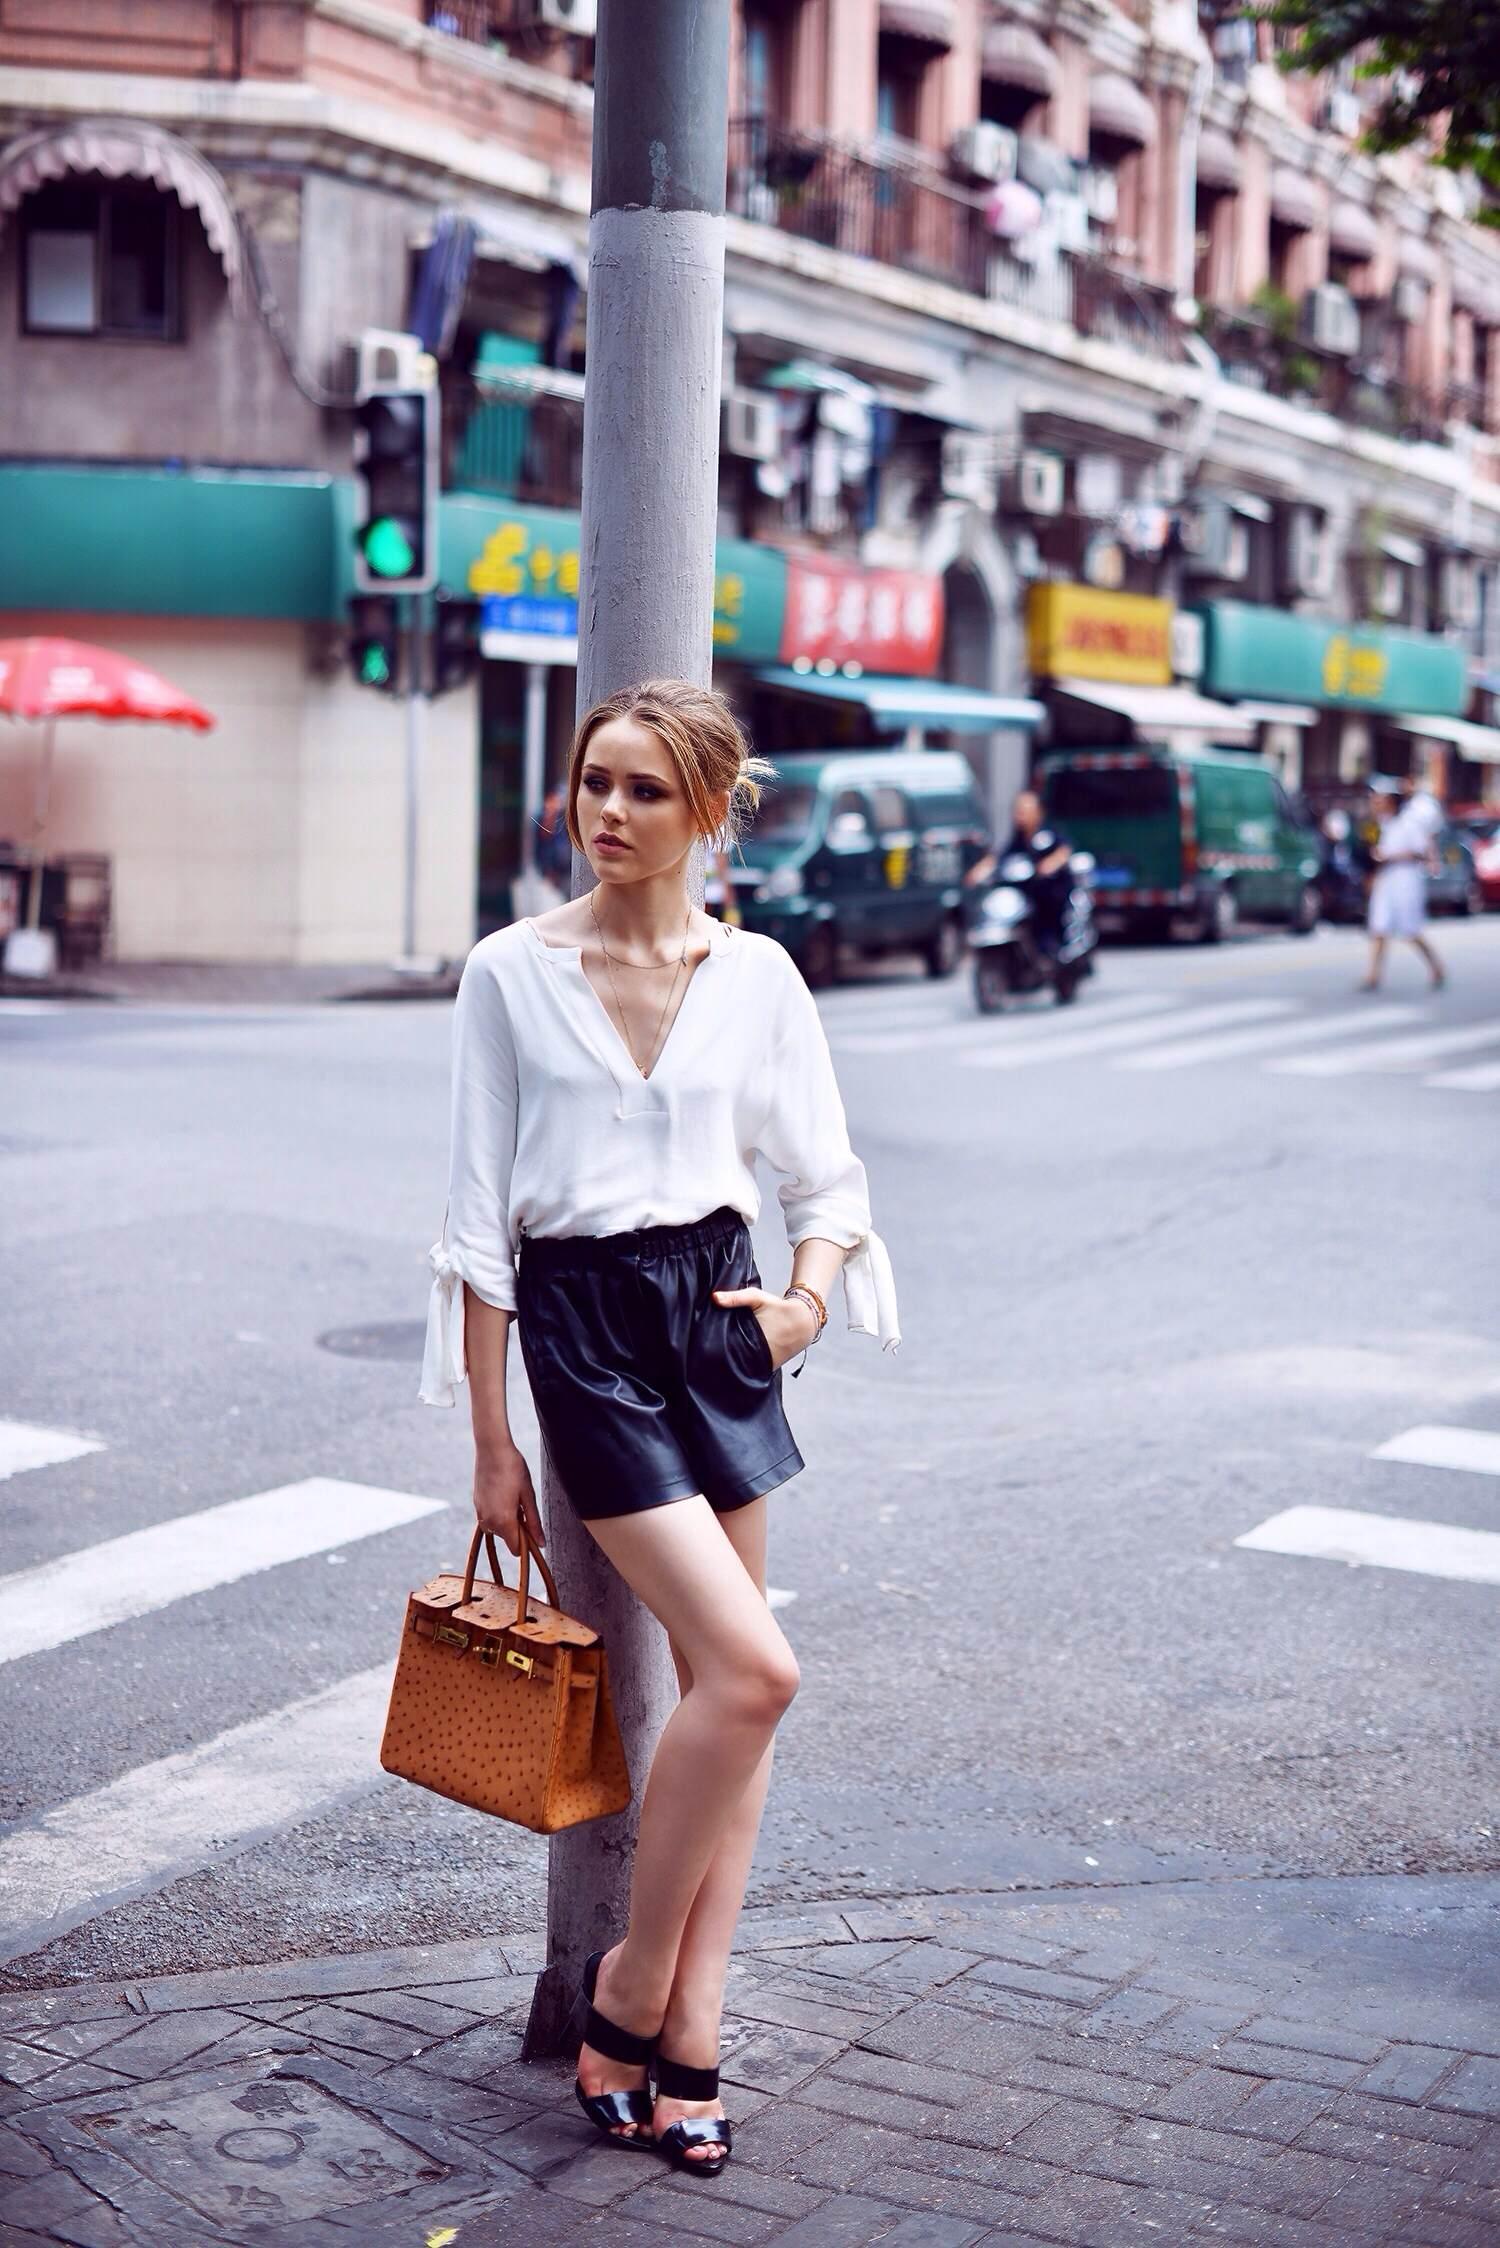 In Between Kayture Bloglovin Camera 8s Instax Shanghai Girl